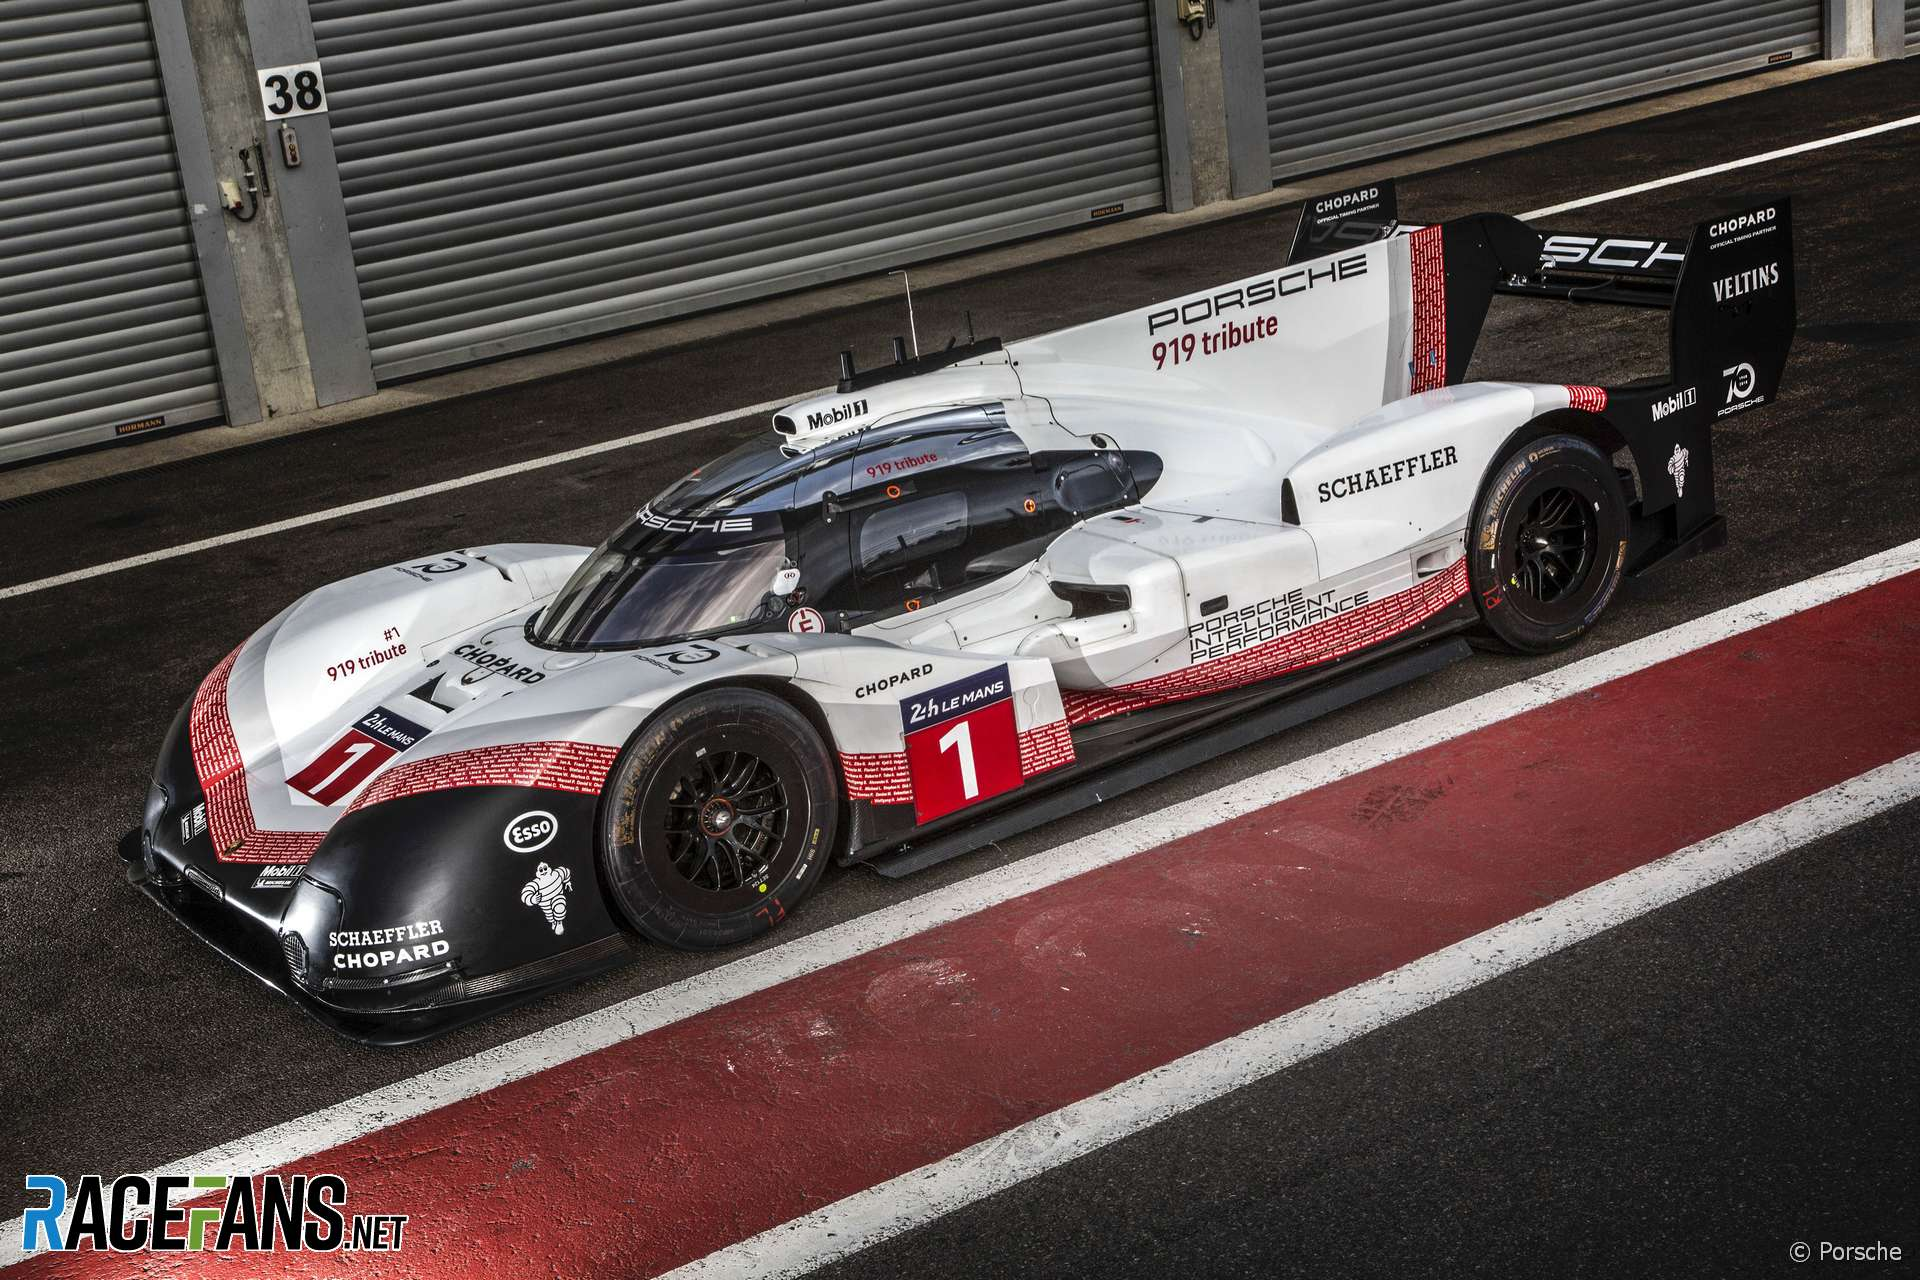 Porsche 919 Hybrid Evo Spa Francorchamps 2018 183 Racefans